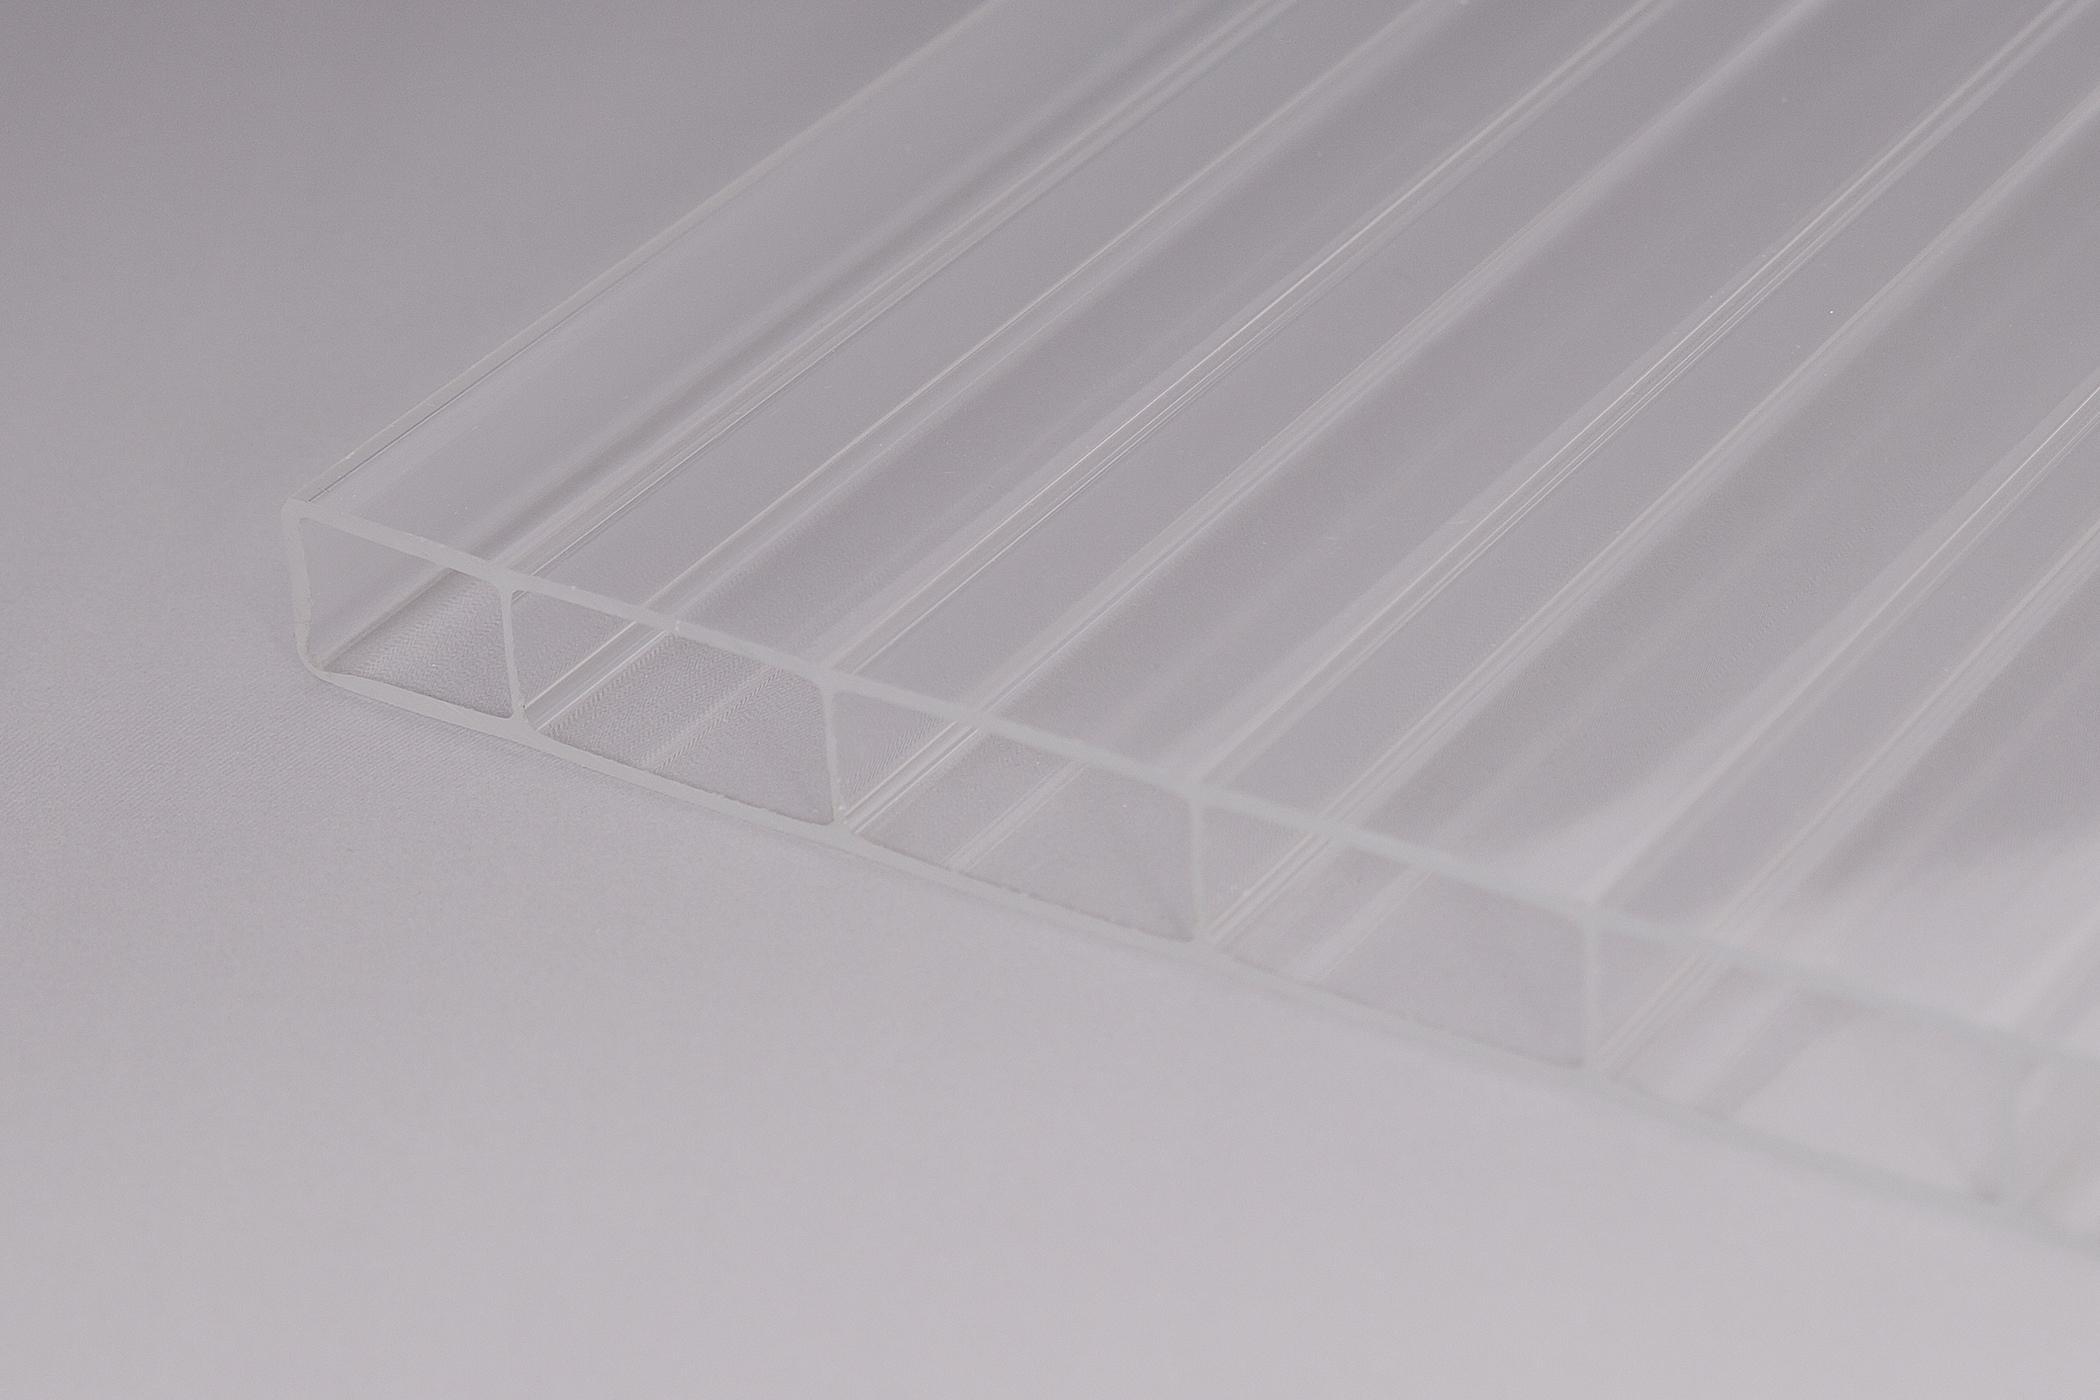 16mm doppelstegplatten acrylglas 16 32 glasklar z une. Black Bedroom Furniture Sets. Home Design Ideas